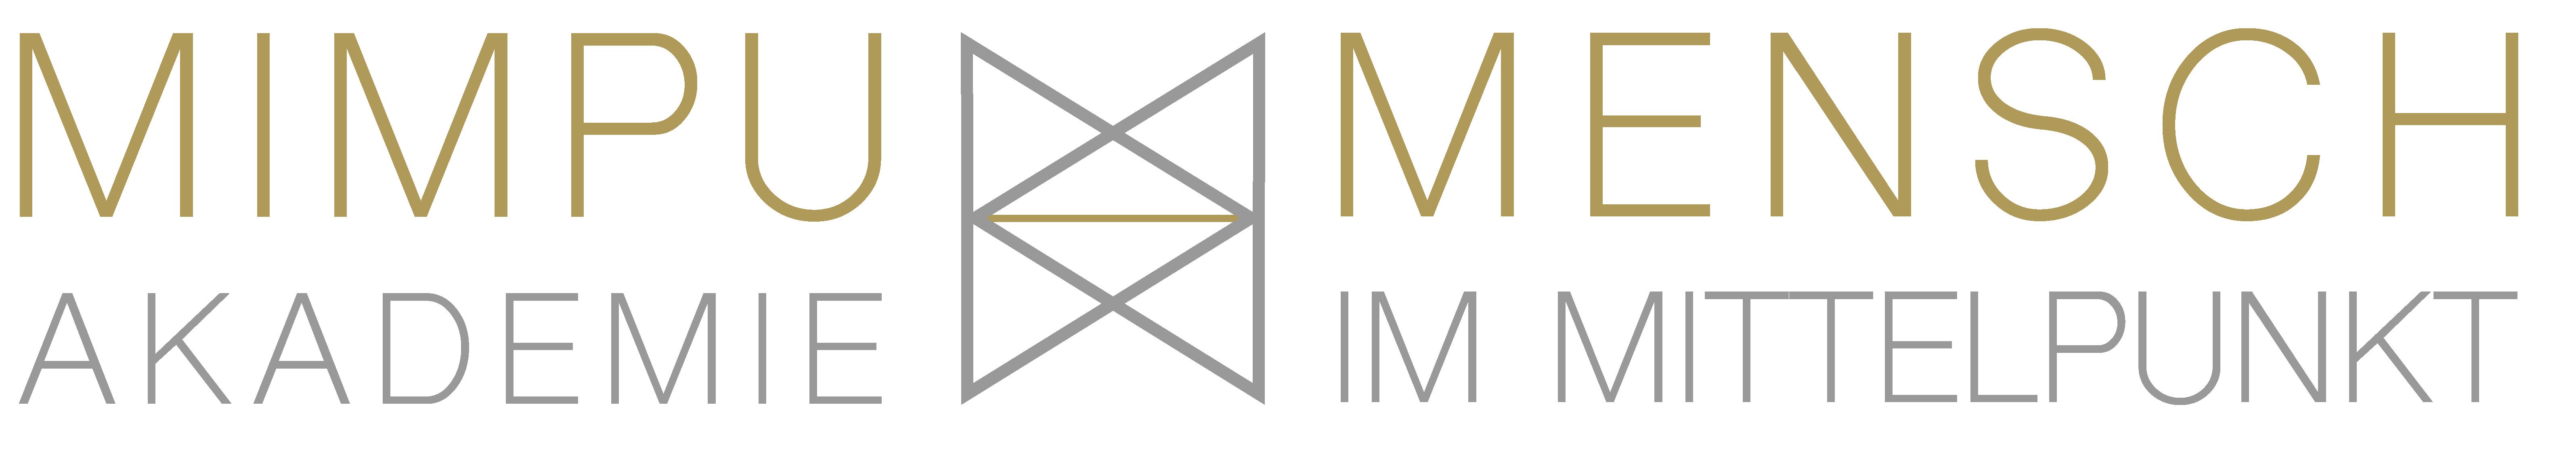 MIMPU_LOGO